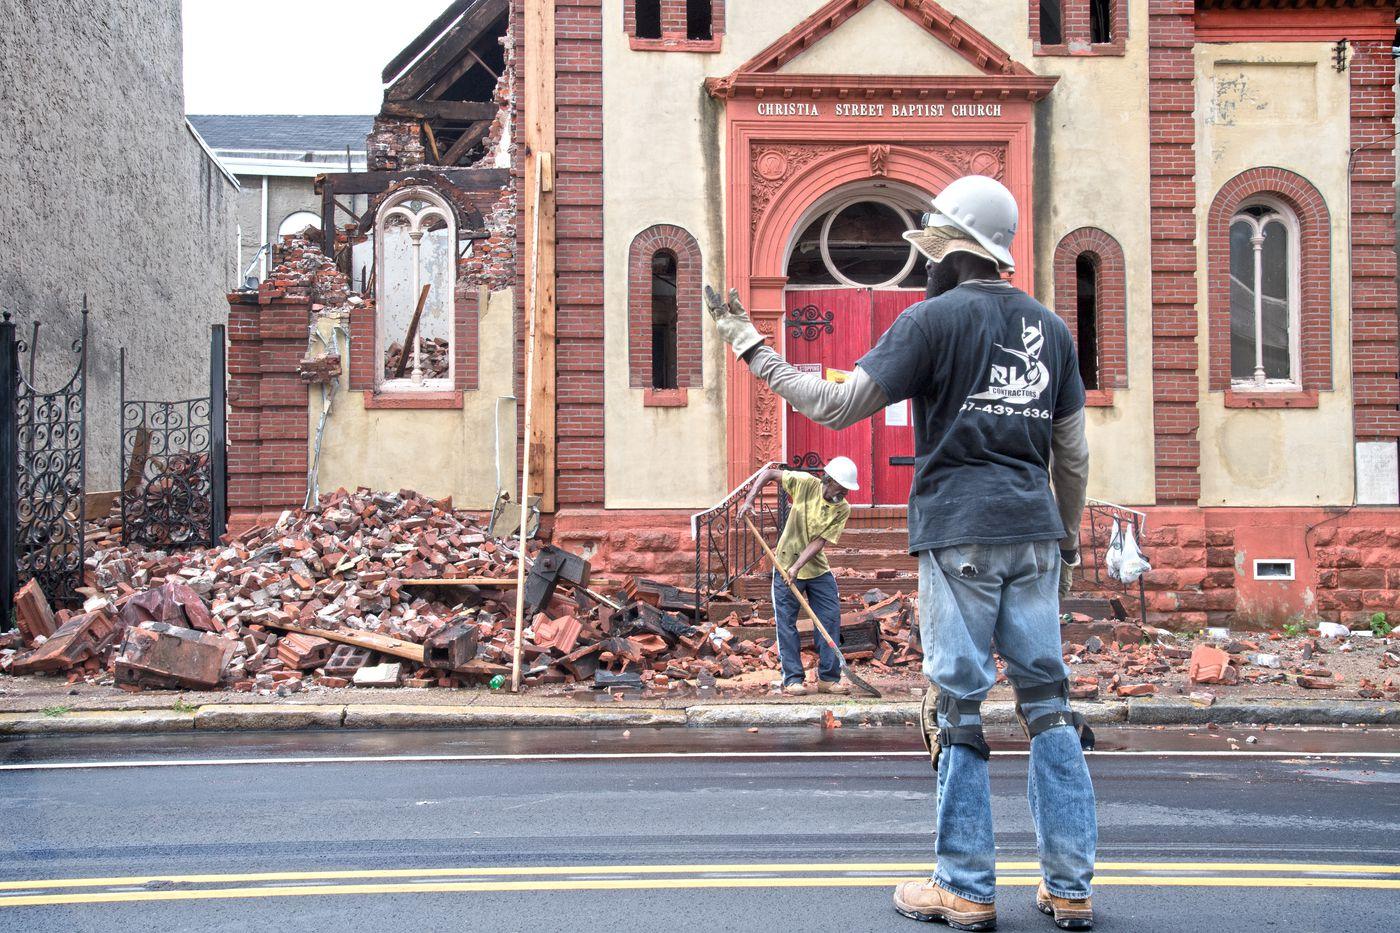 In July, the Christian Street Baptist Church in Bella Vista was demolished.